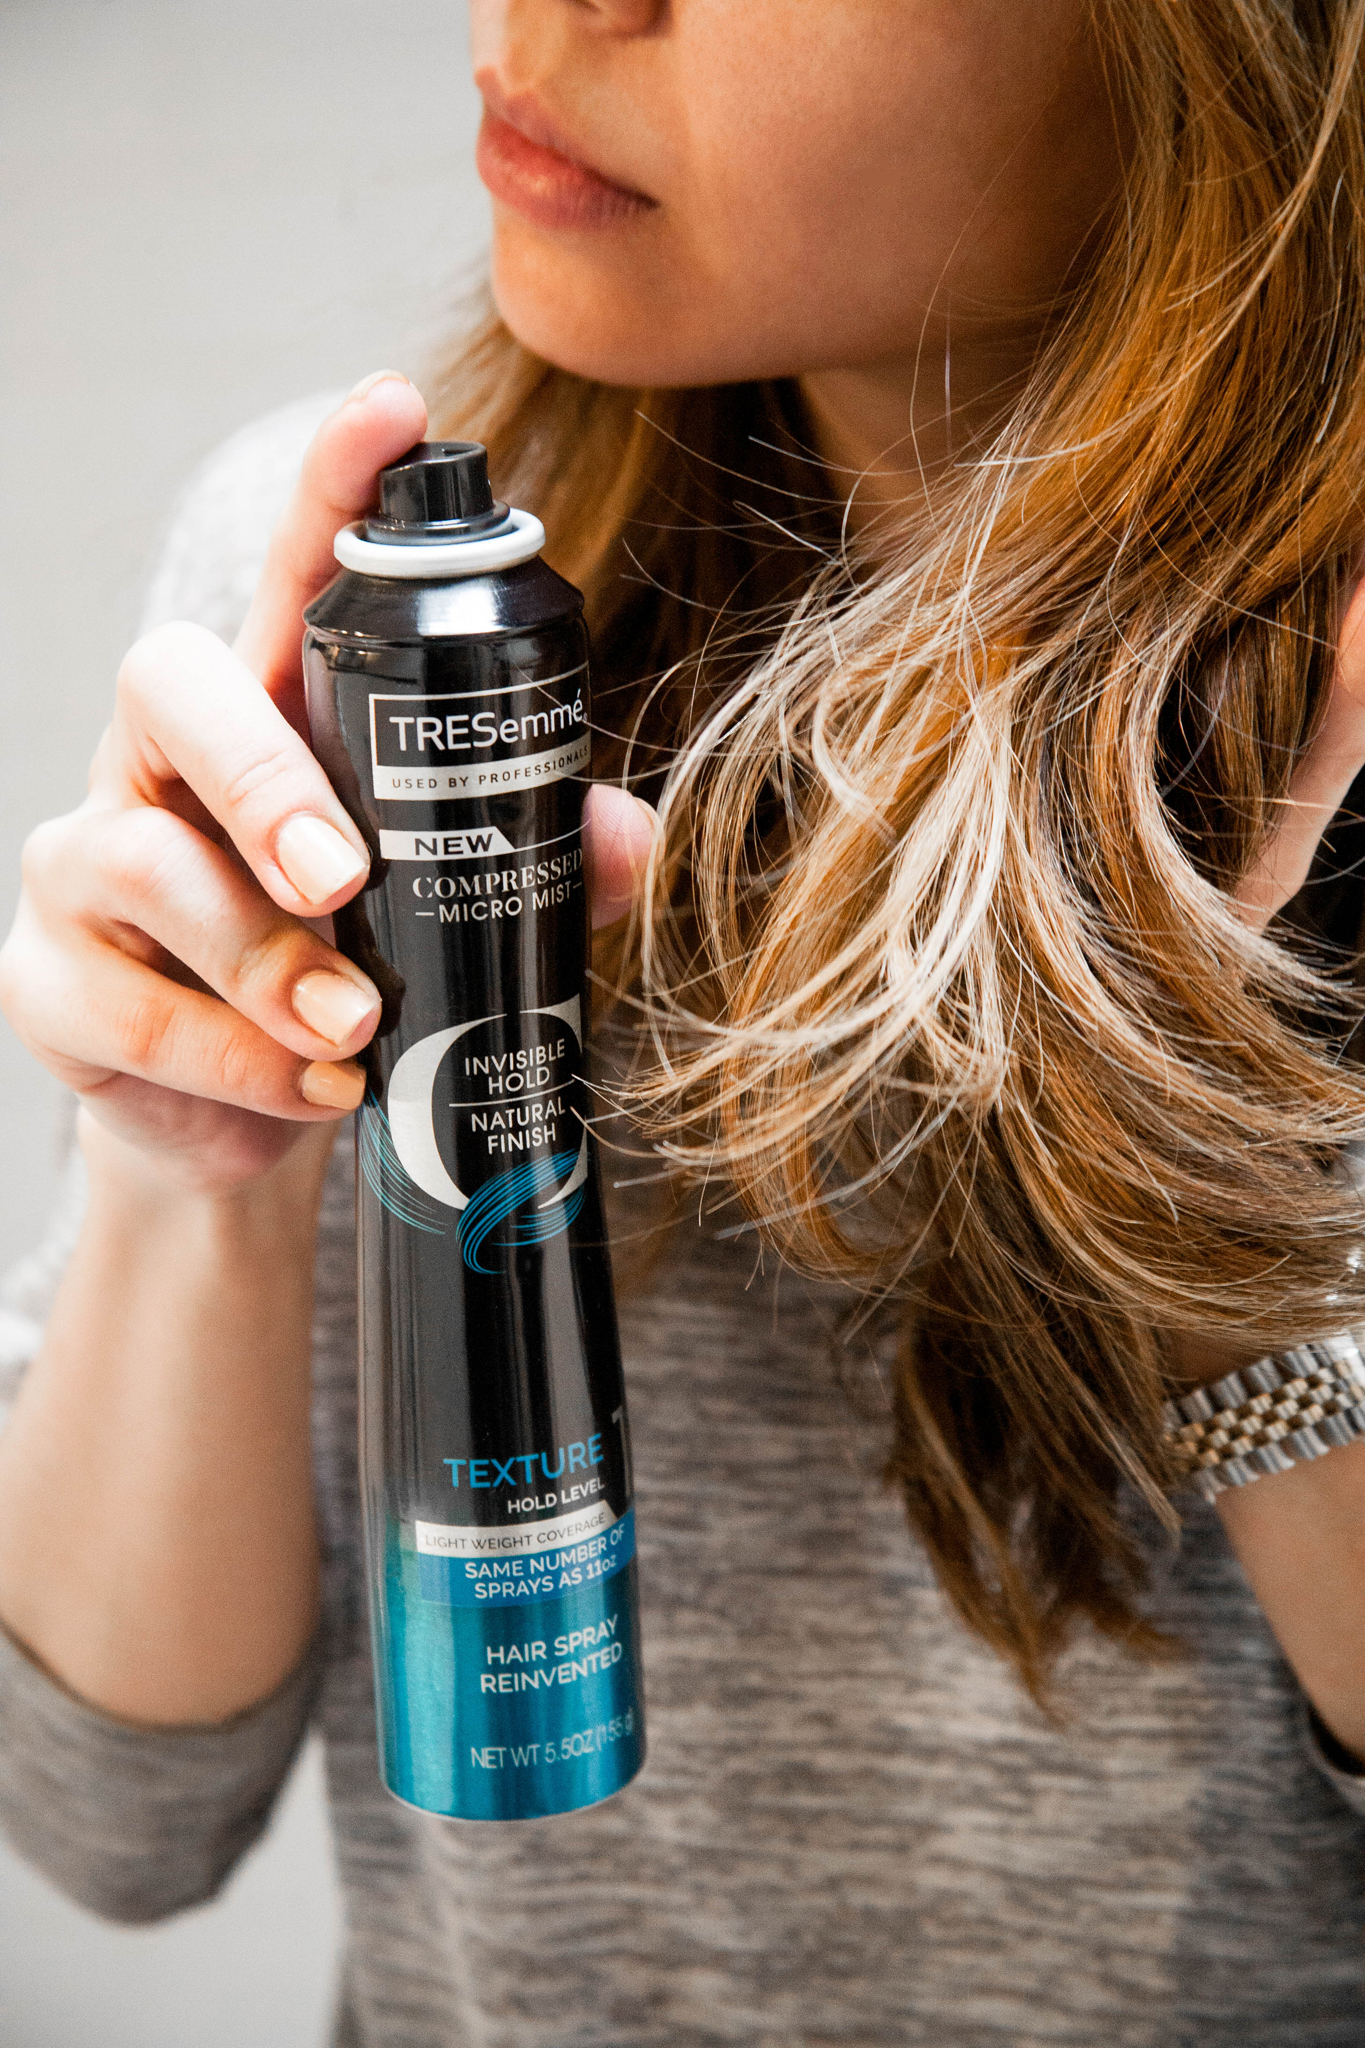 TRESemmé Compressed Micro Mist Hairspray Texture